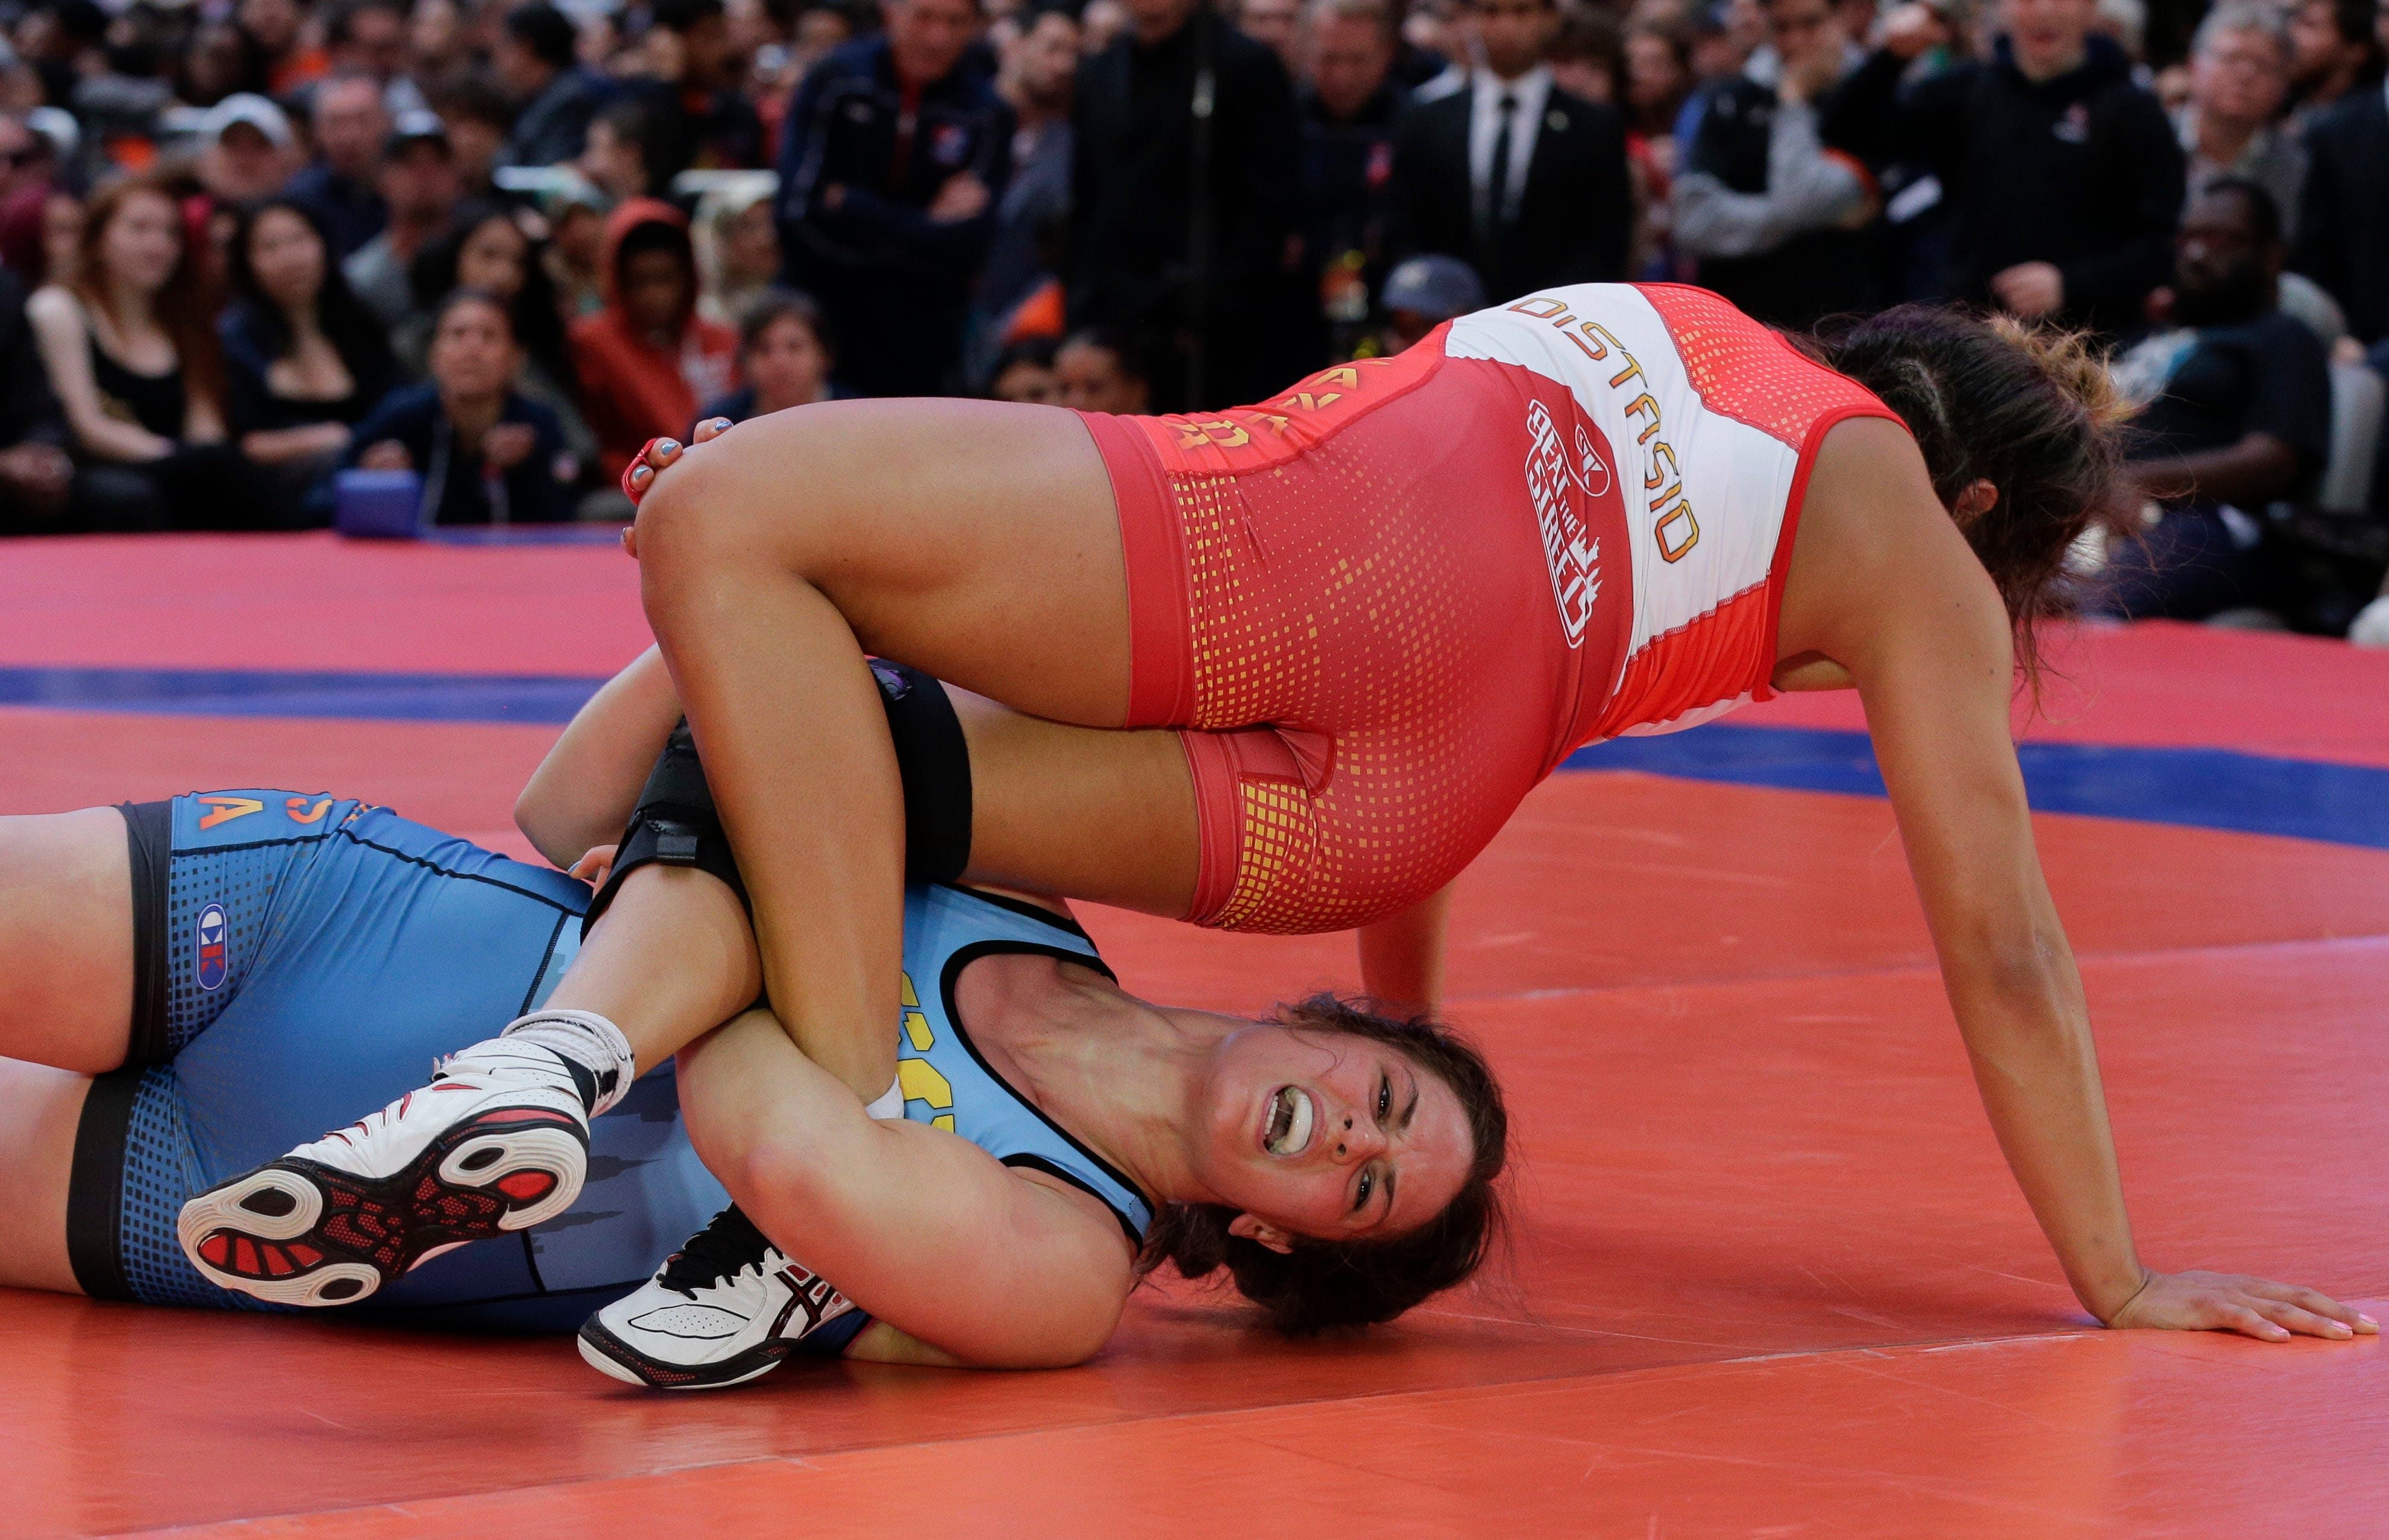 Freestyle wrestling mixed domination